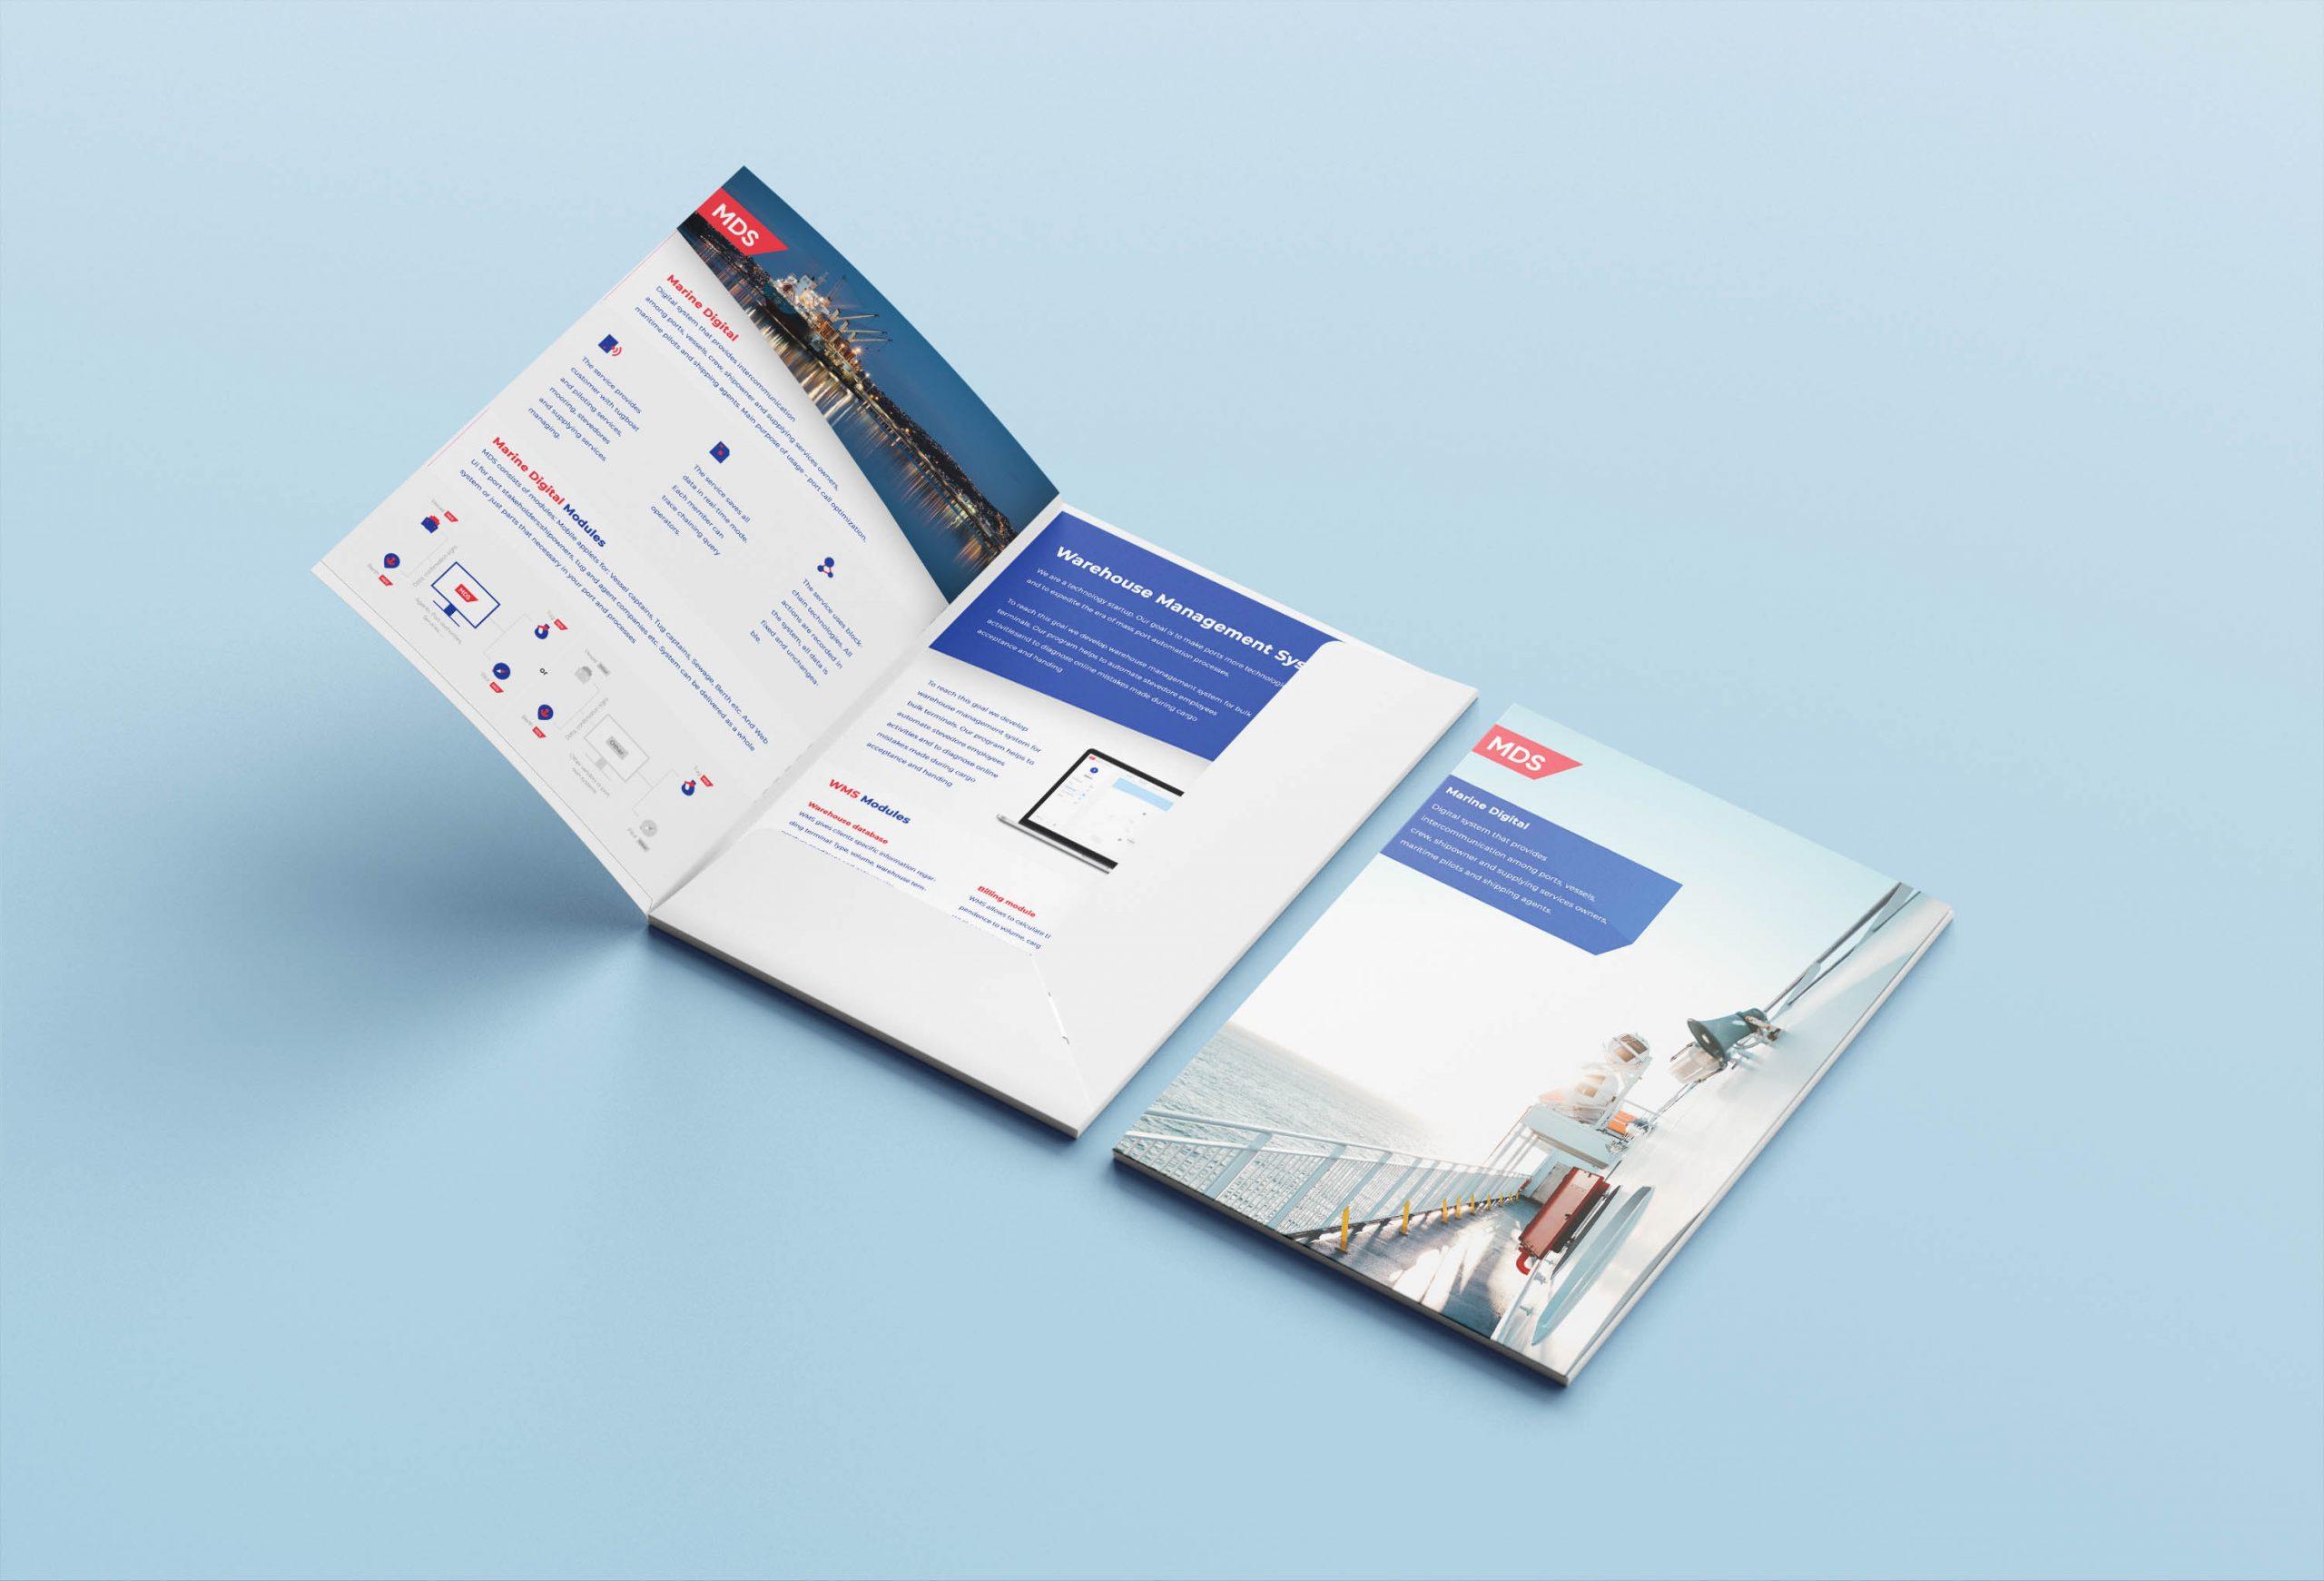 Marine Digital Systems – Brochure